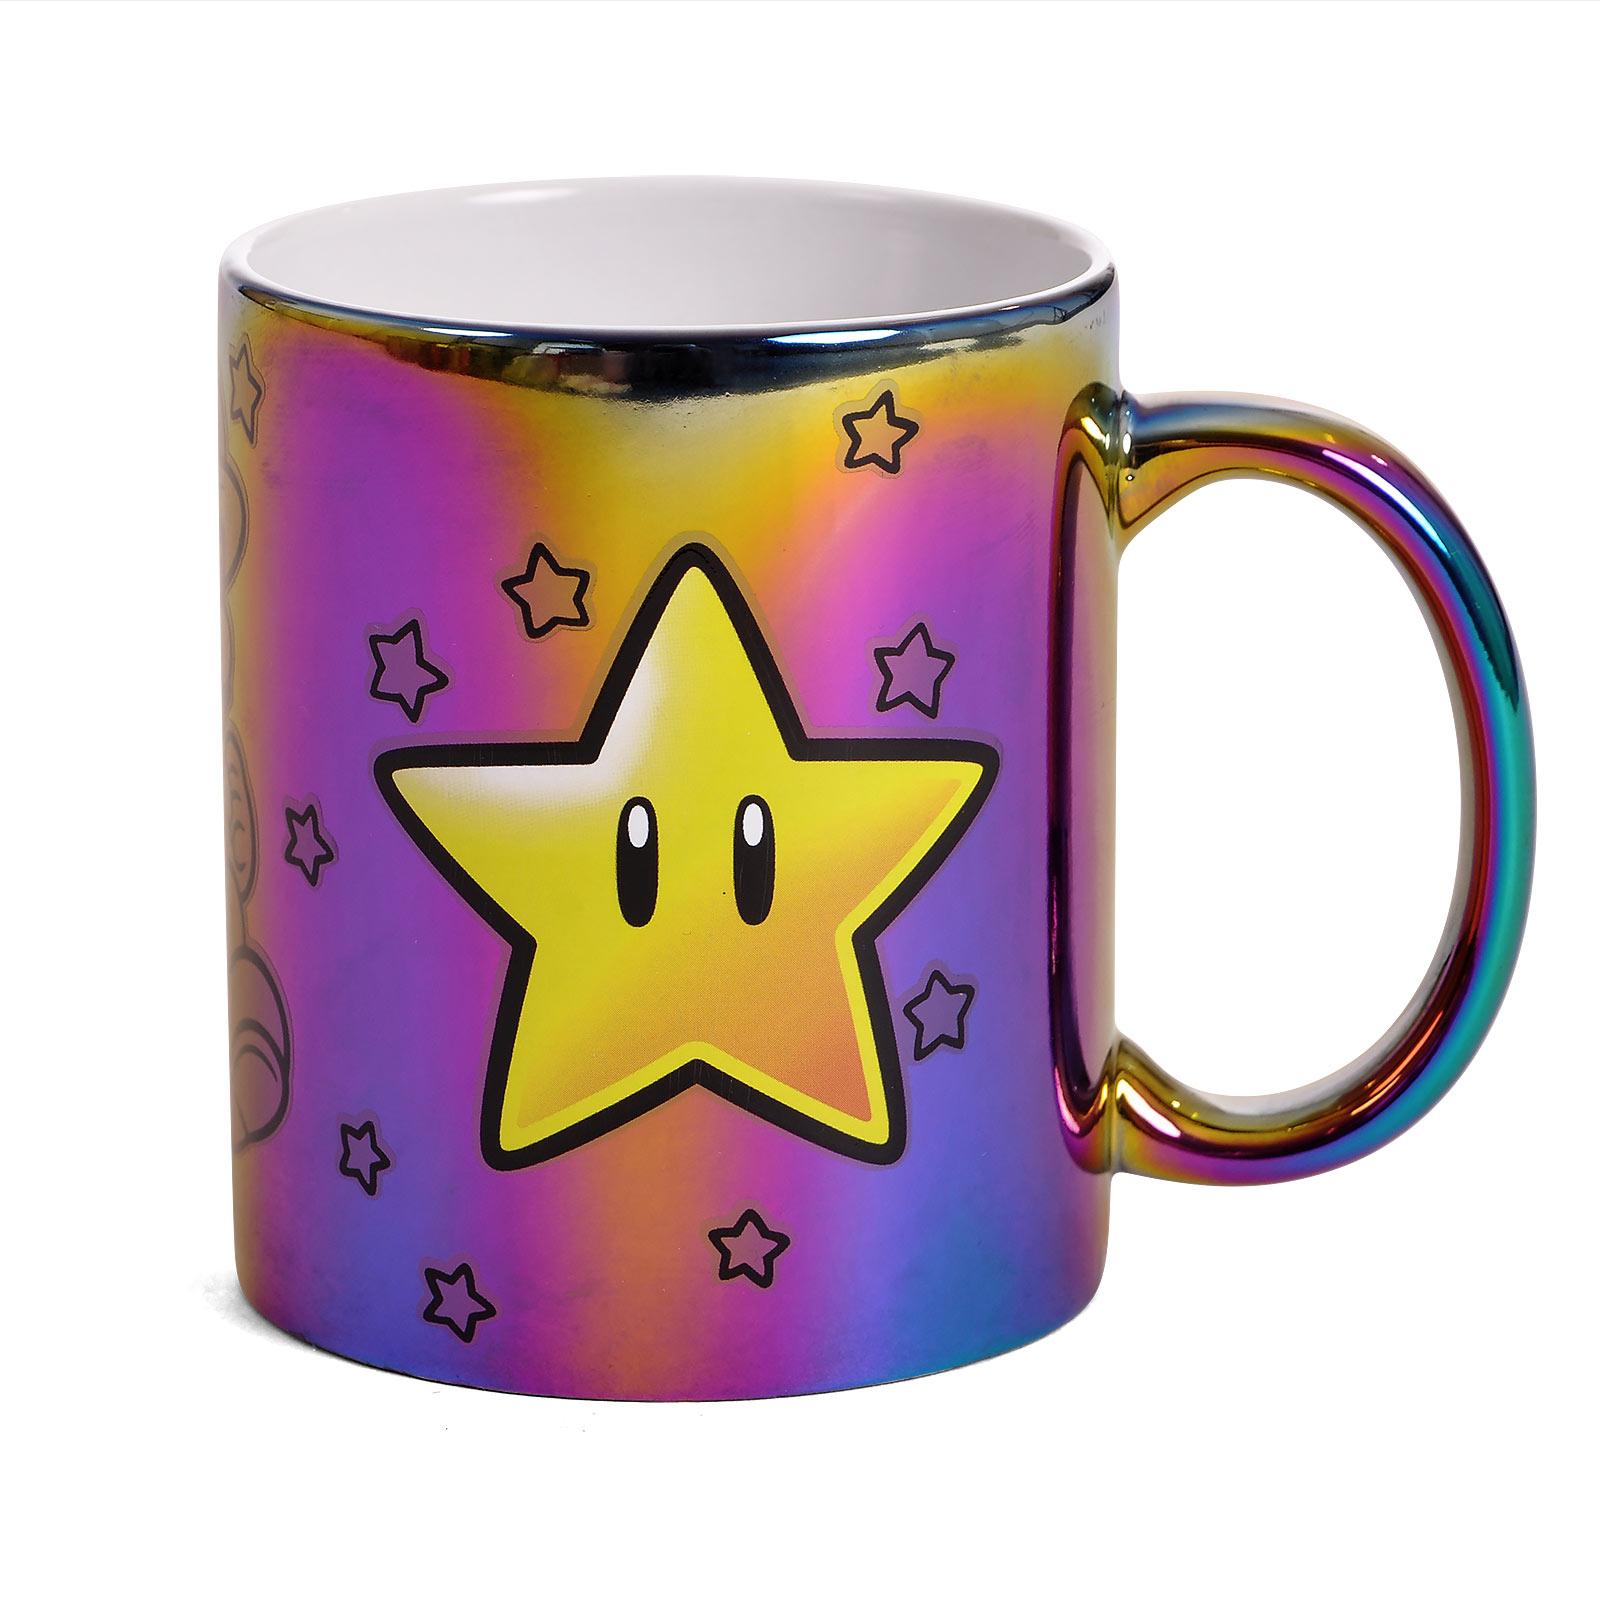 Super Mario - Star Power Metallic Tasse